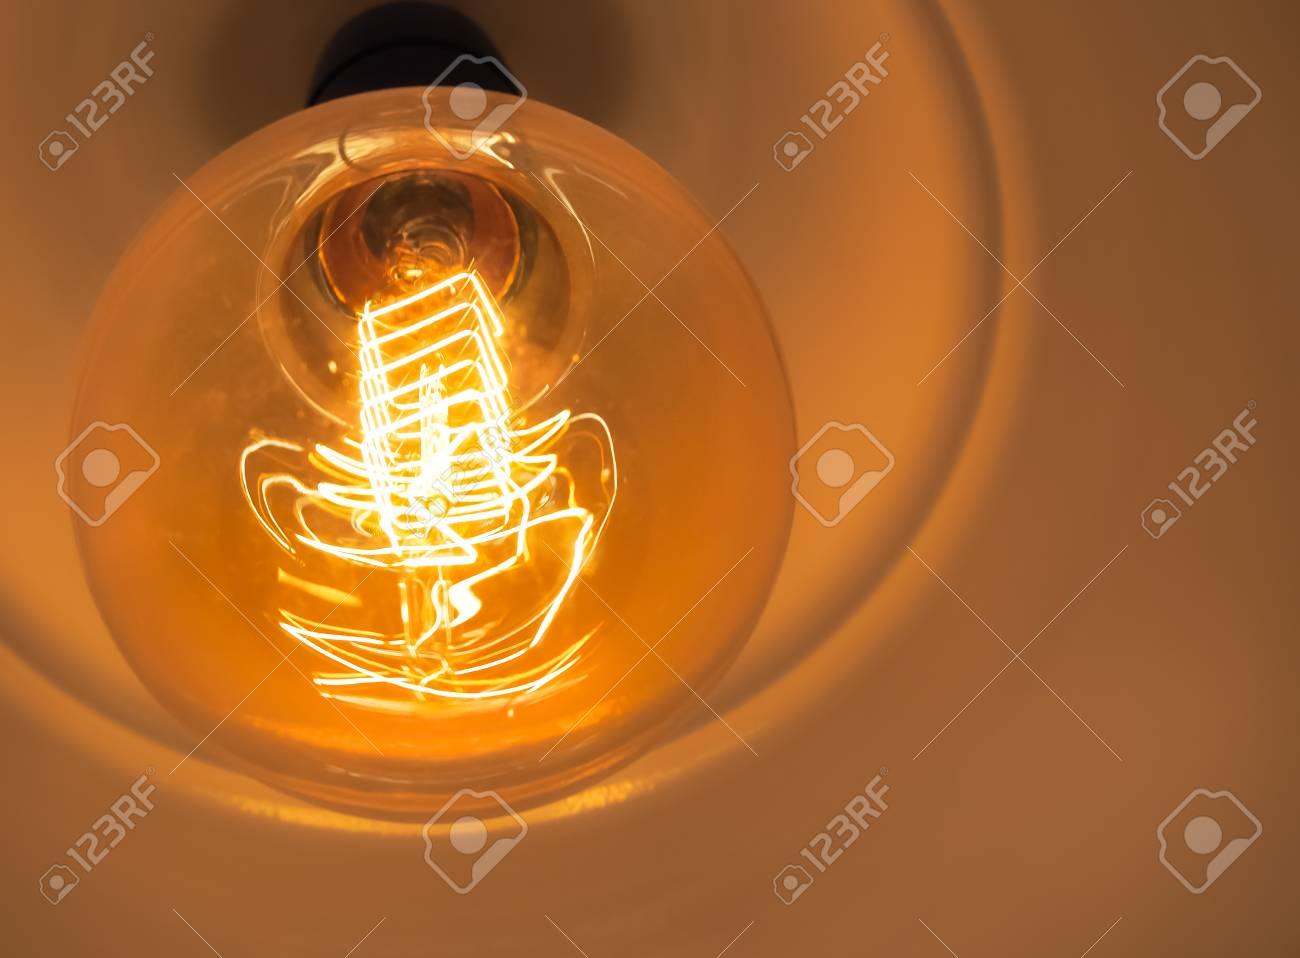 vintage glühende glühbirne, close up und selektiven fokus (glühbirne